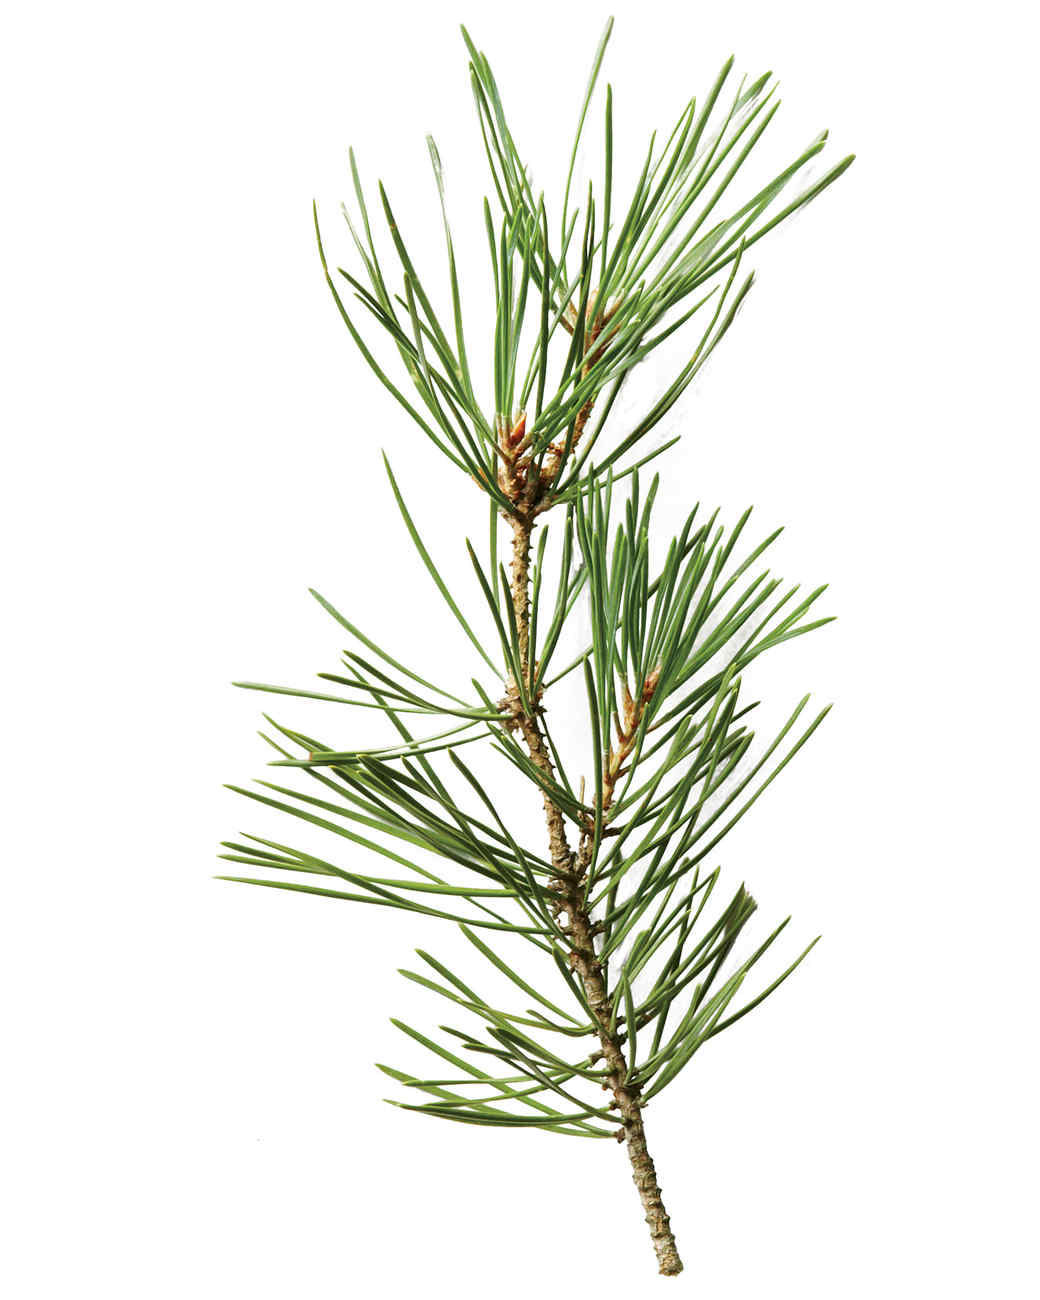 scotch-pine-mld107876.jpg